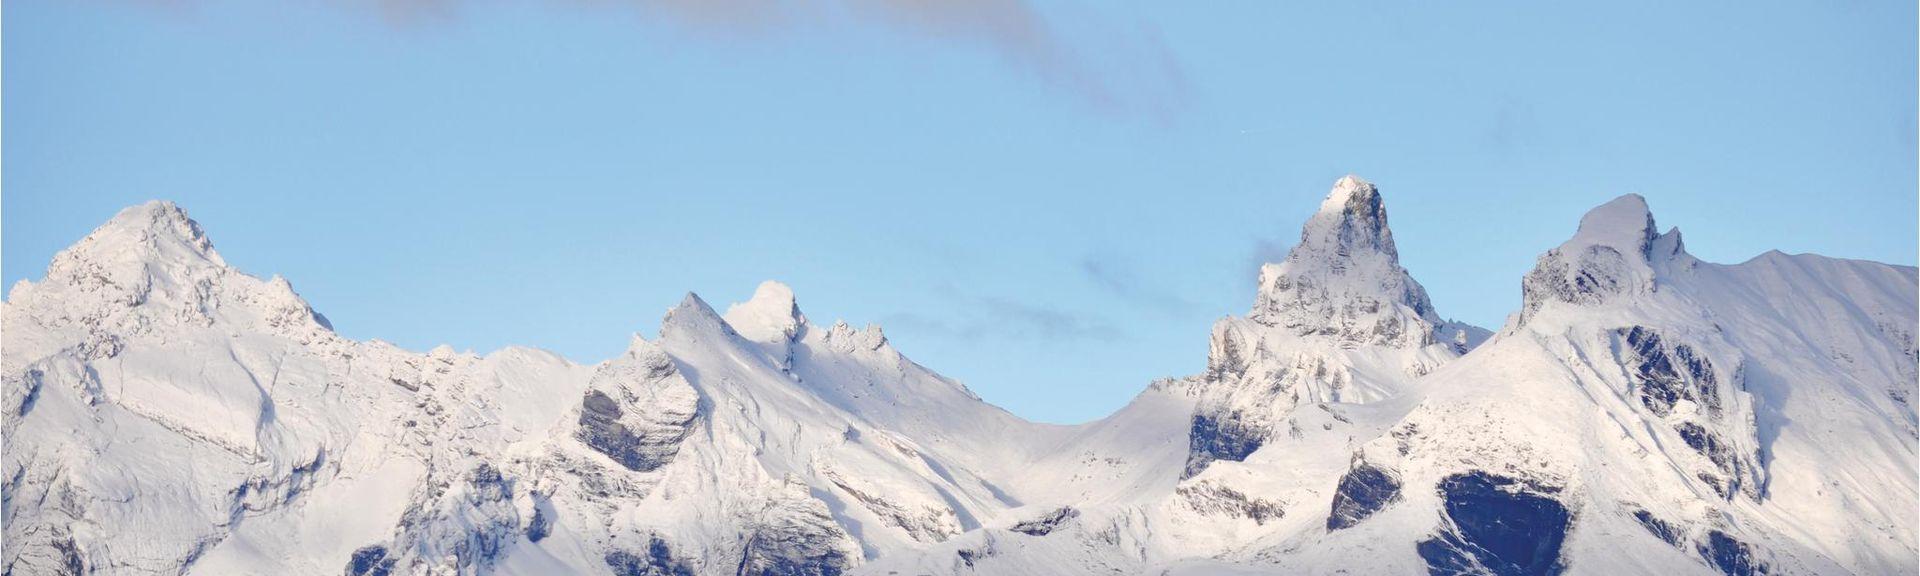 Chamoson, Wallis, Schweiz